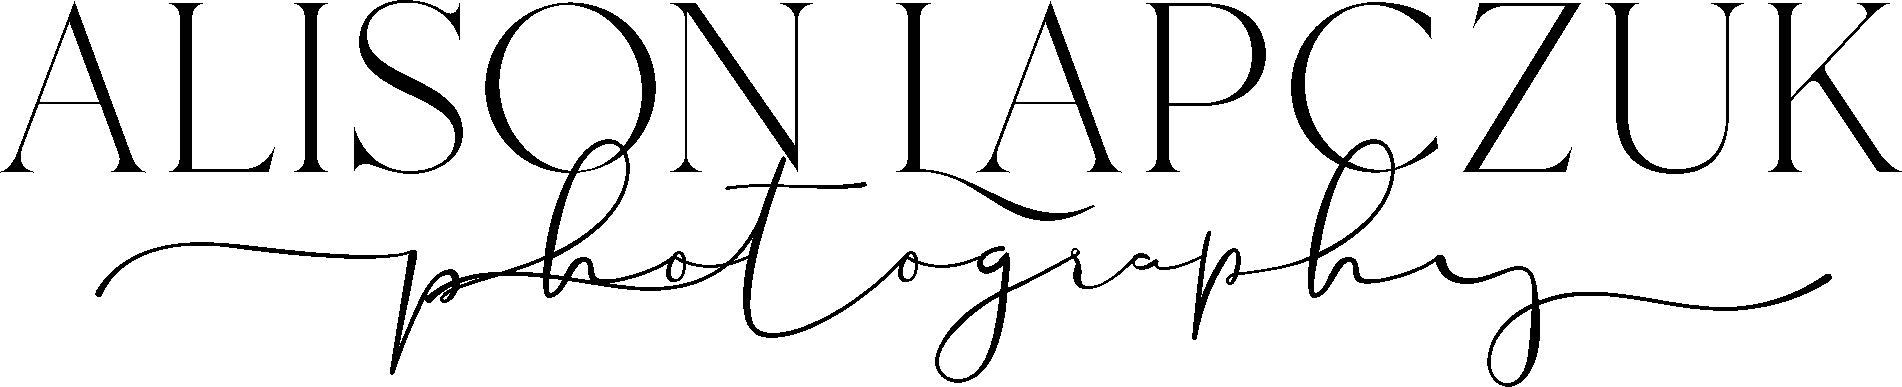 alison lapczuk photography logo